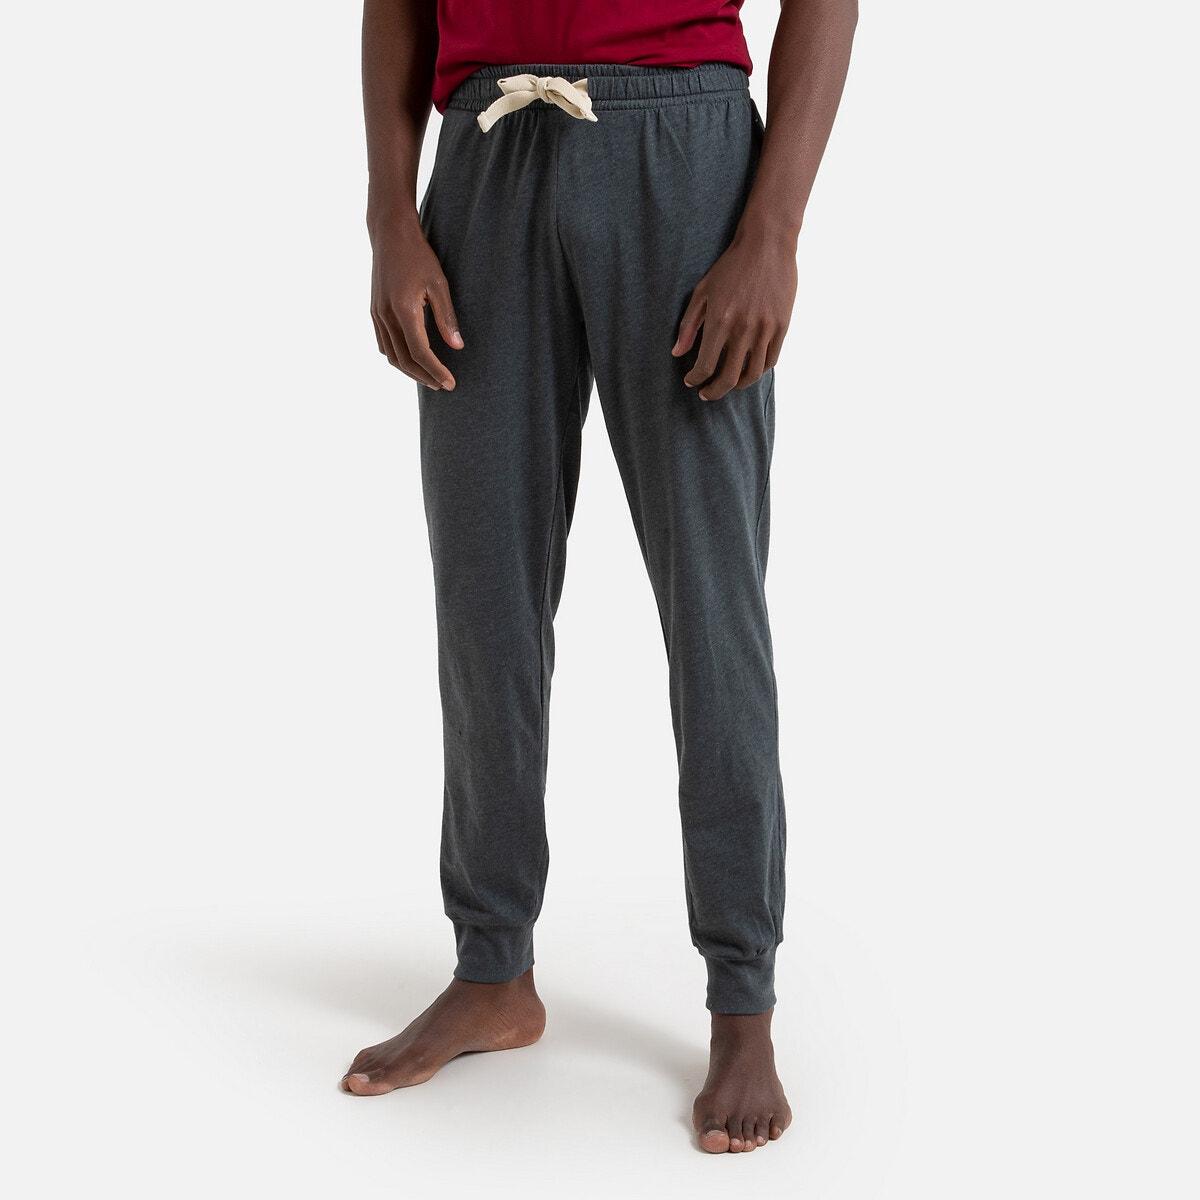 La Redoute Collections - Βαμβακερό παντελόνι πυτζάμας 324383409 - 3682&0001